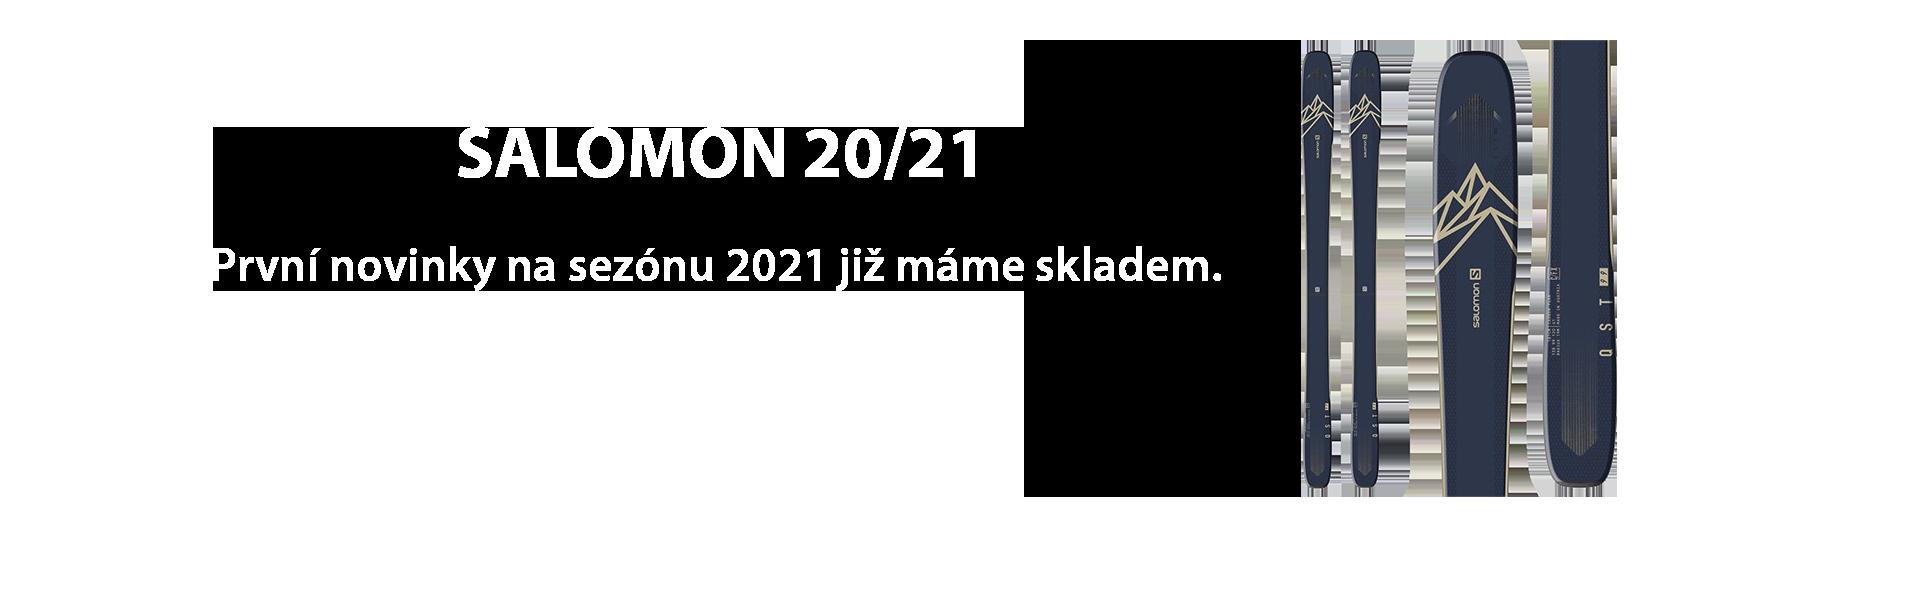 Salomon 20/21